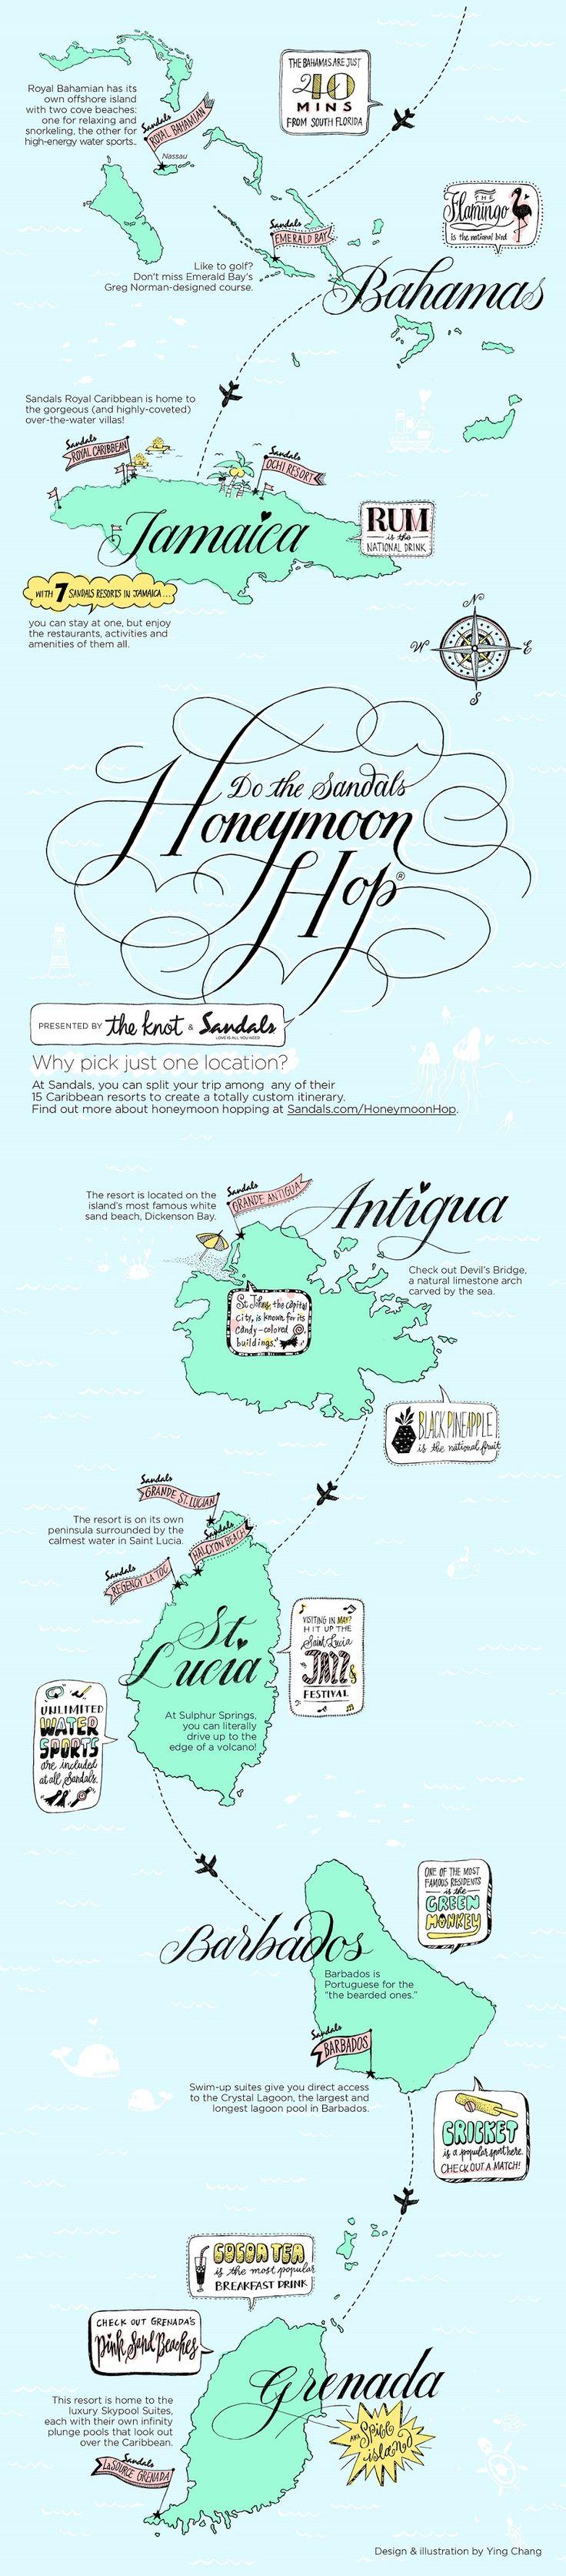 Infographic: Do the Sandals & Beaches Honeymoon Hop - Sandals Wedding Blog